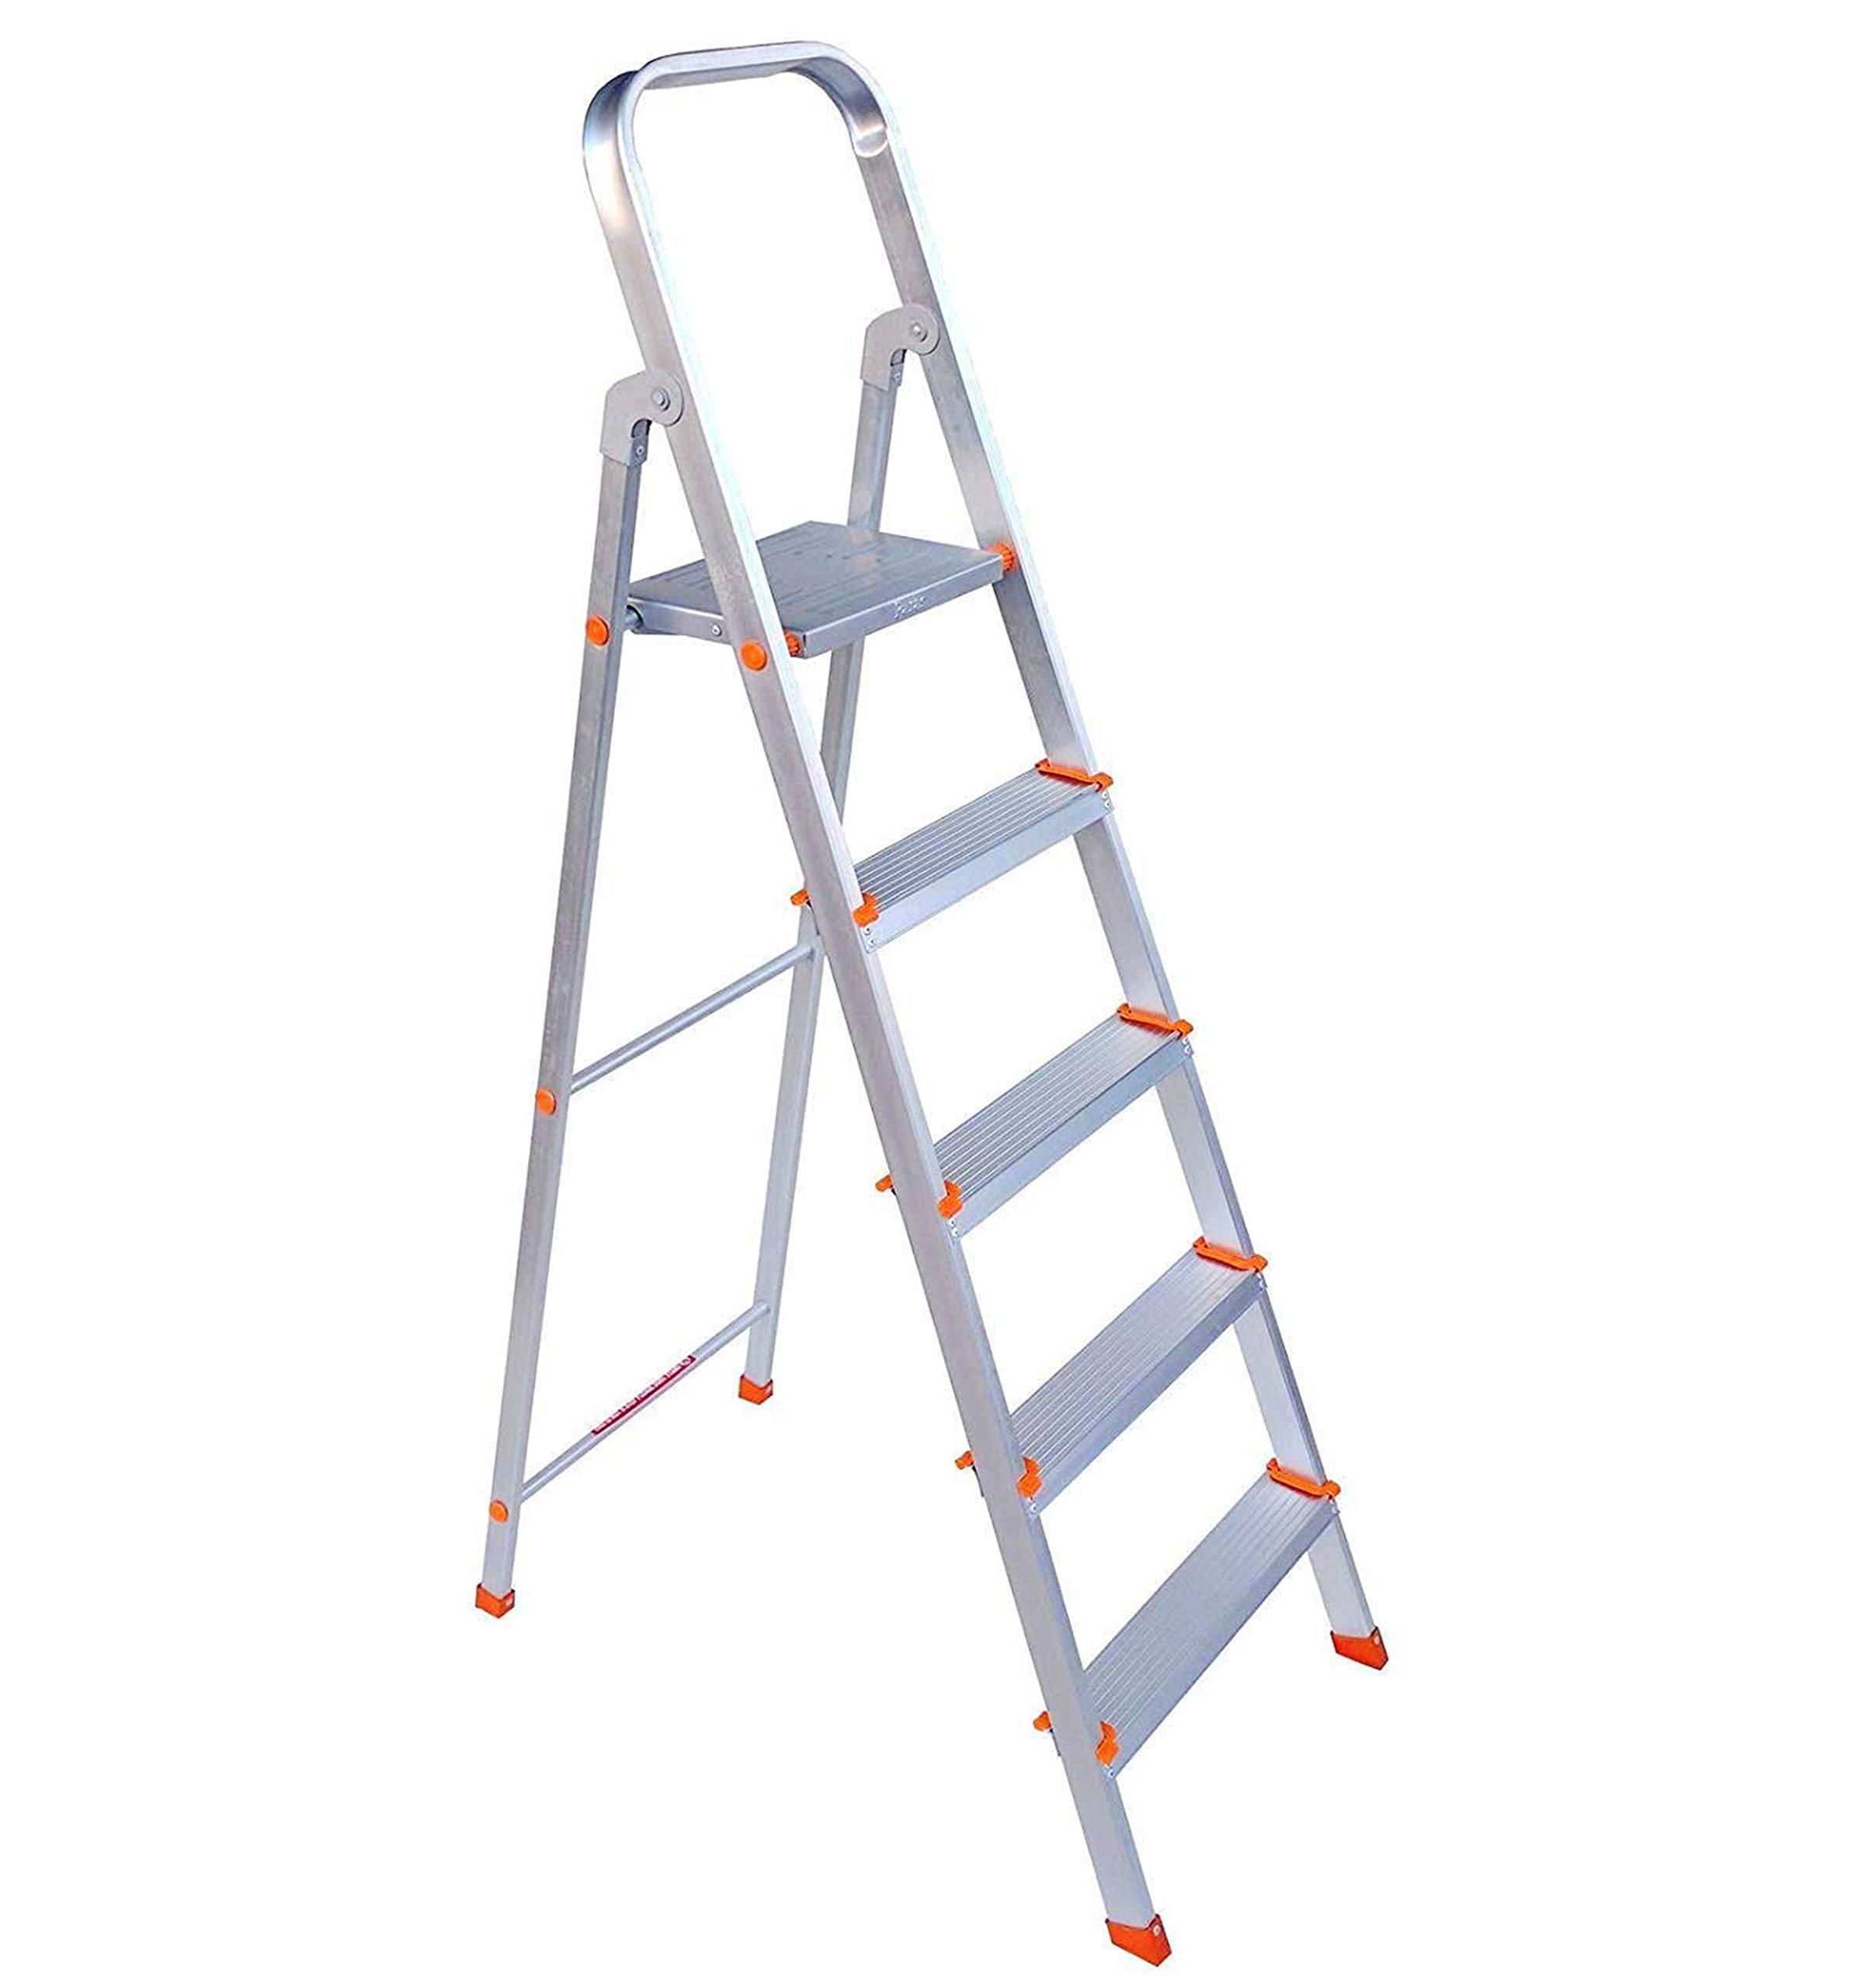 Paras Corporation 5 Step Foldable Aluminium Ladder for Home Use(Silver) (B07RMTRZ8N) Amazon Price History, Amazon Price Tracker